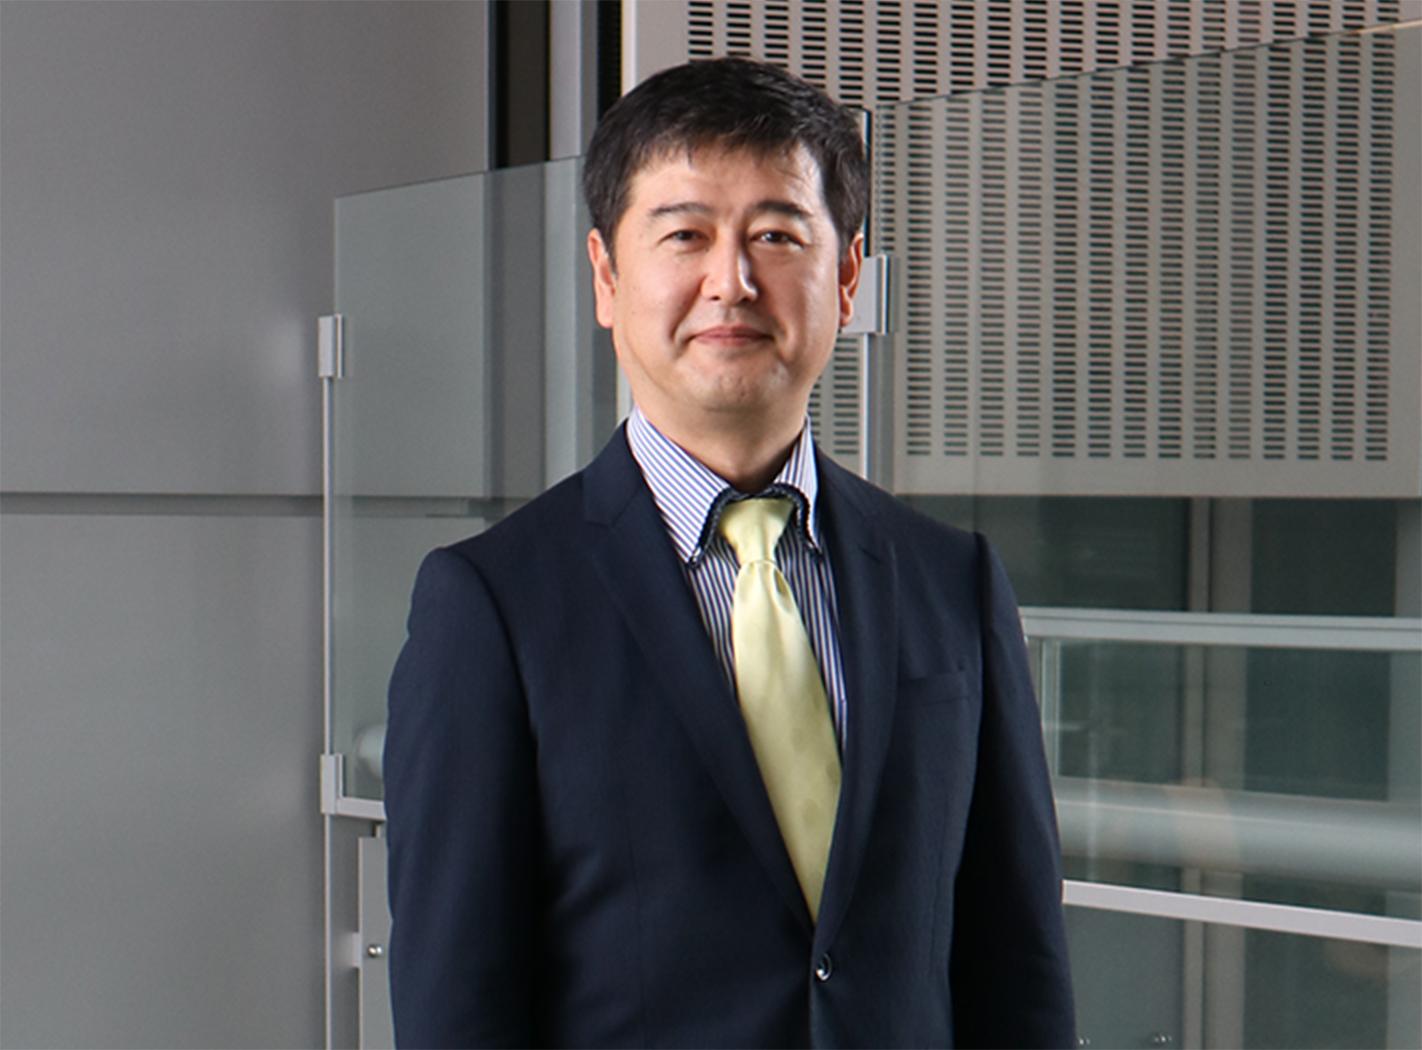 株式会社エヌエムシイ 営業部 部長 鈴木 智博